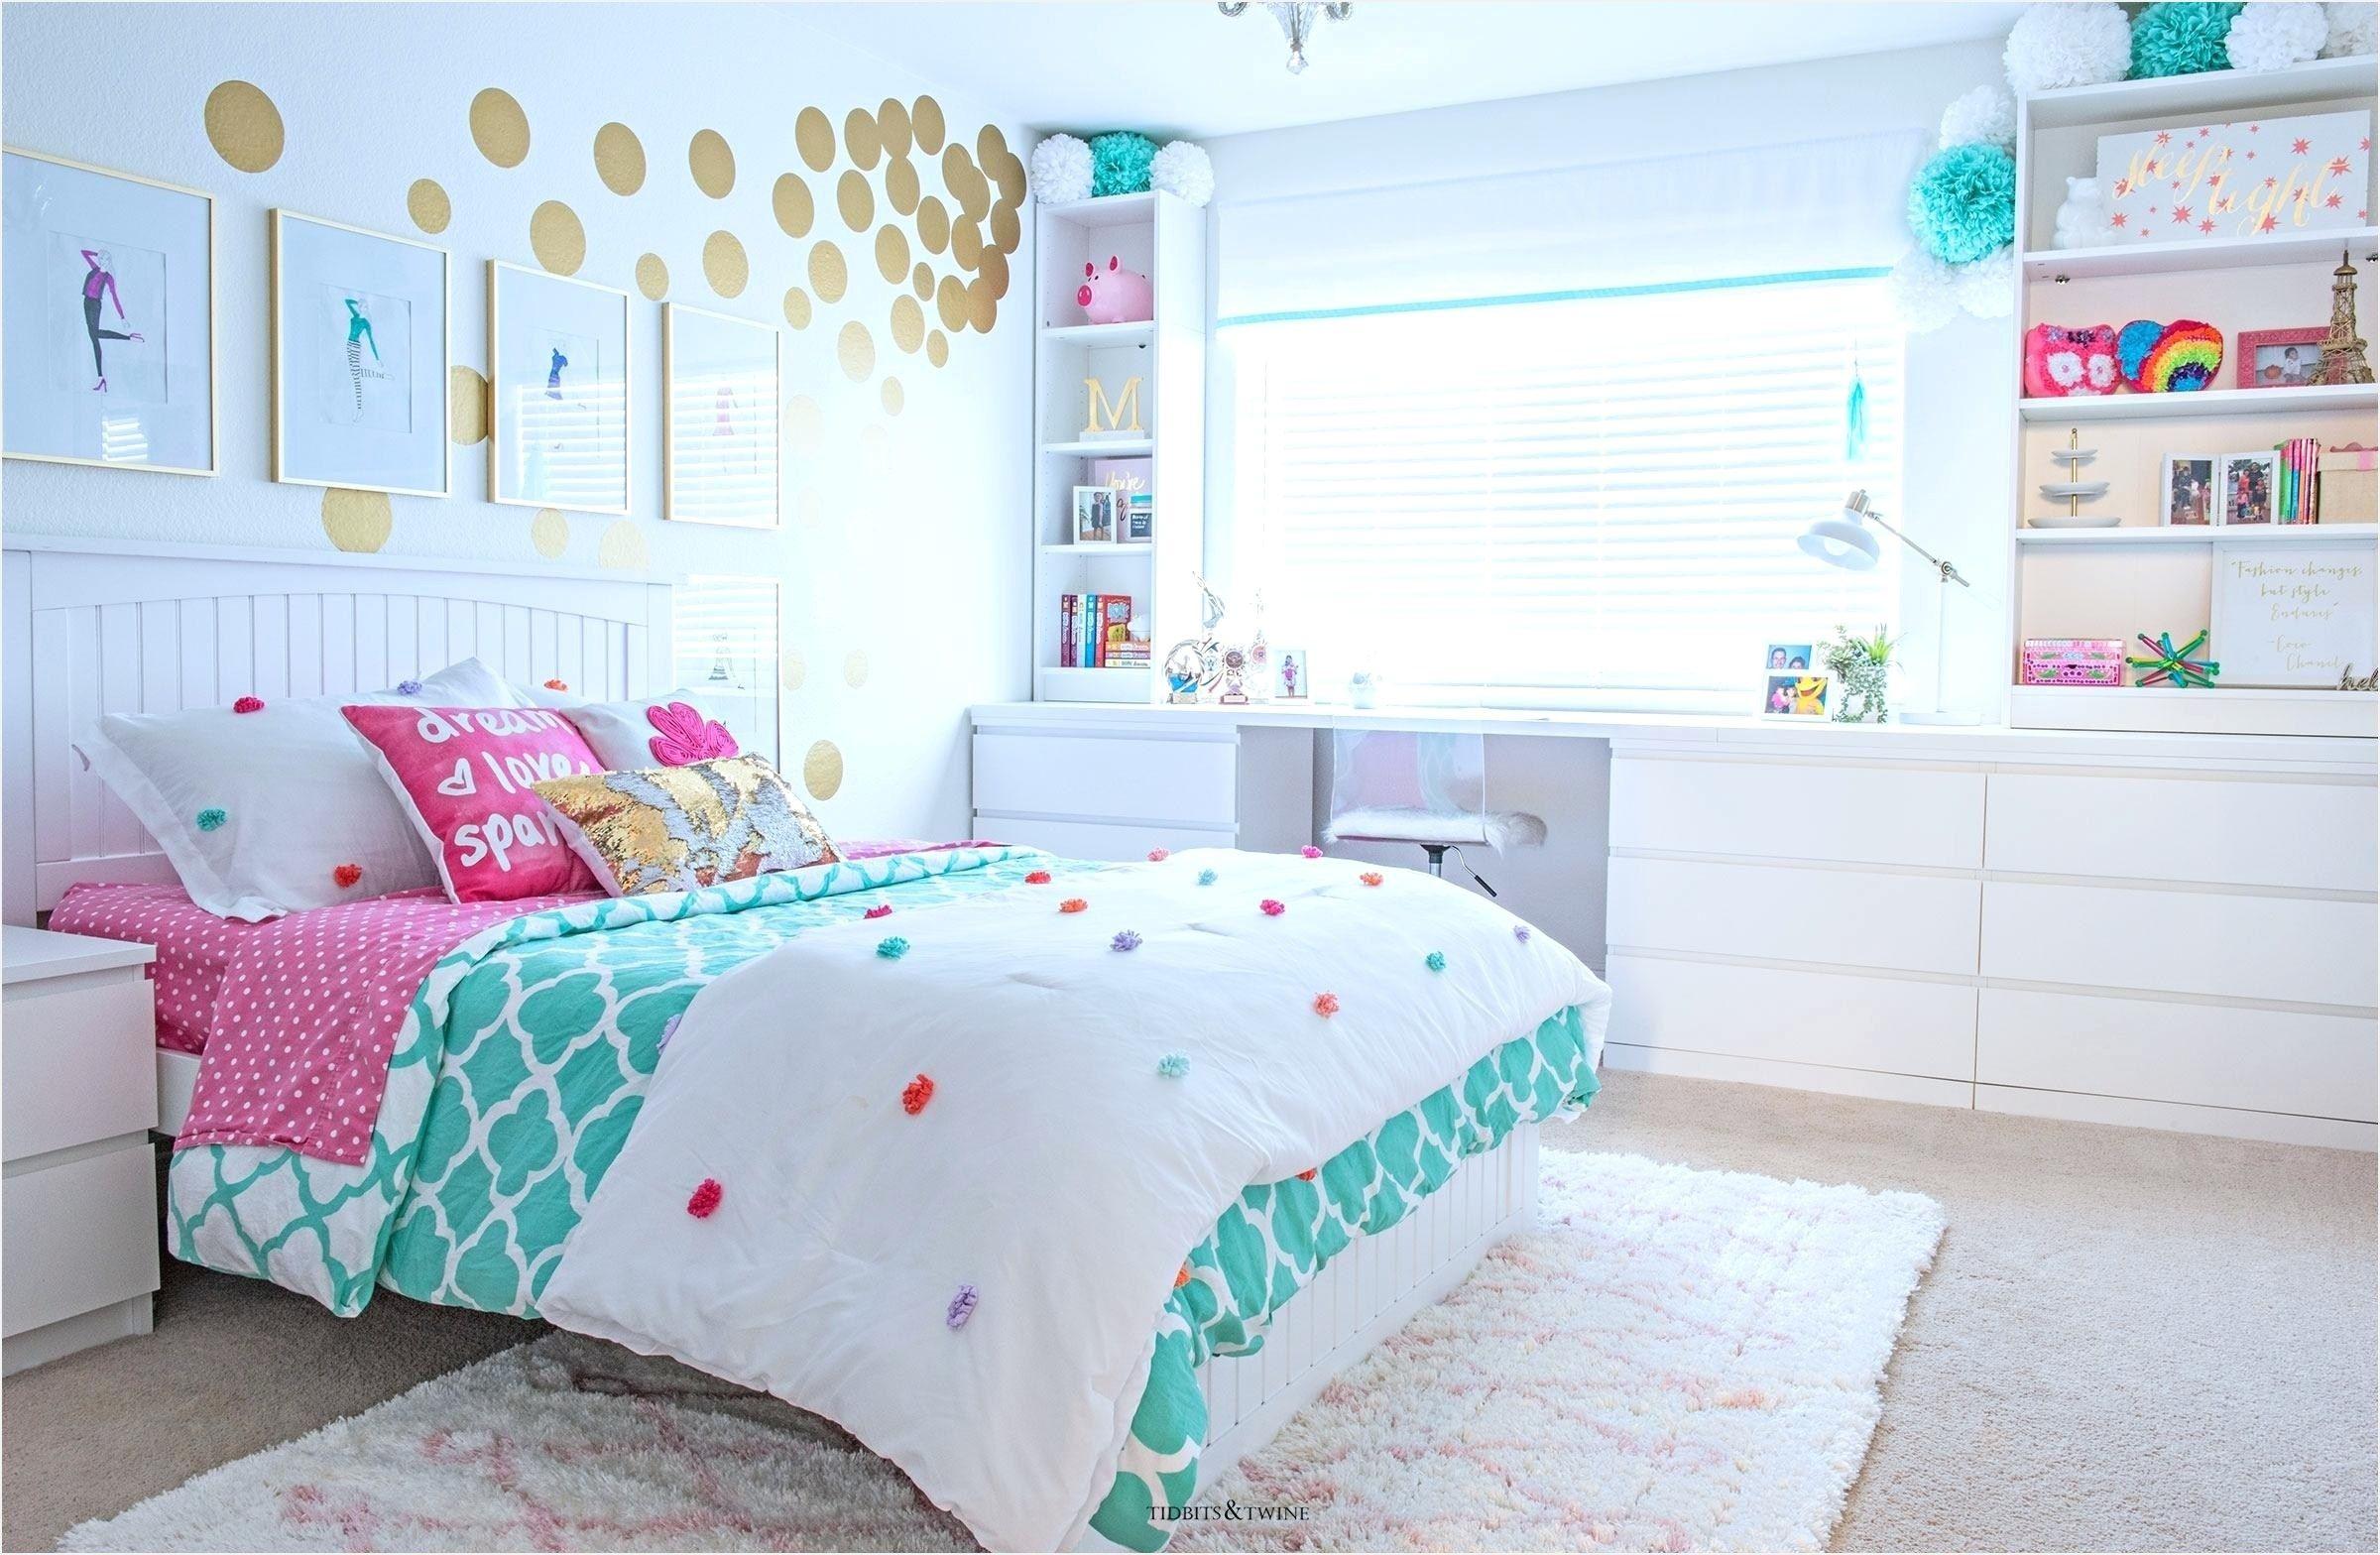 Girls Bedroom Makeover Ideas in 2020 | Bedroom for girls ...